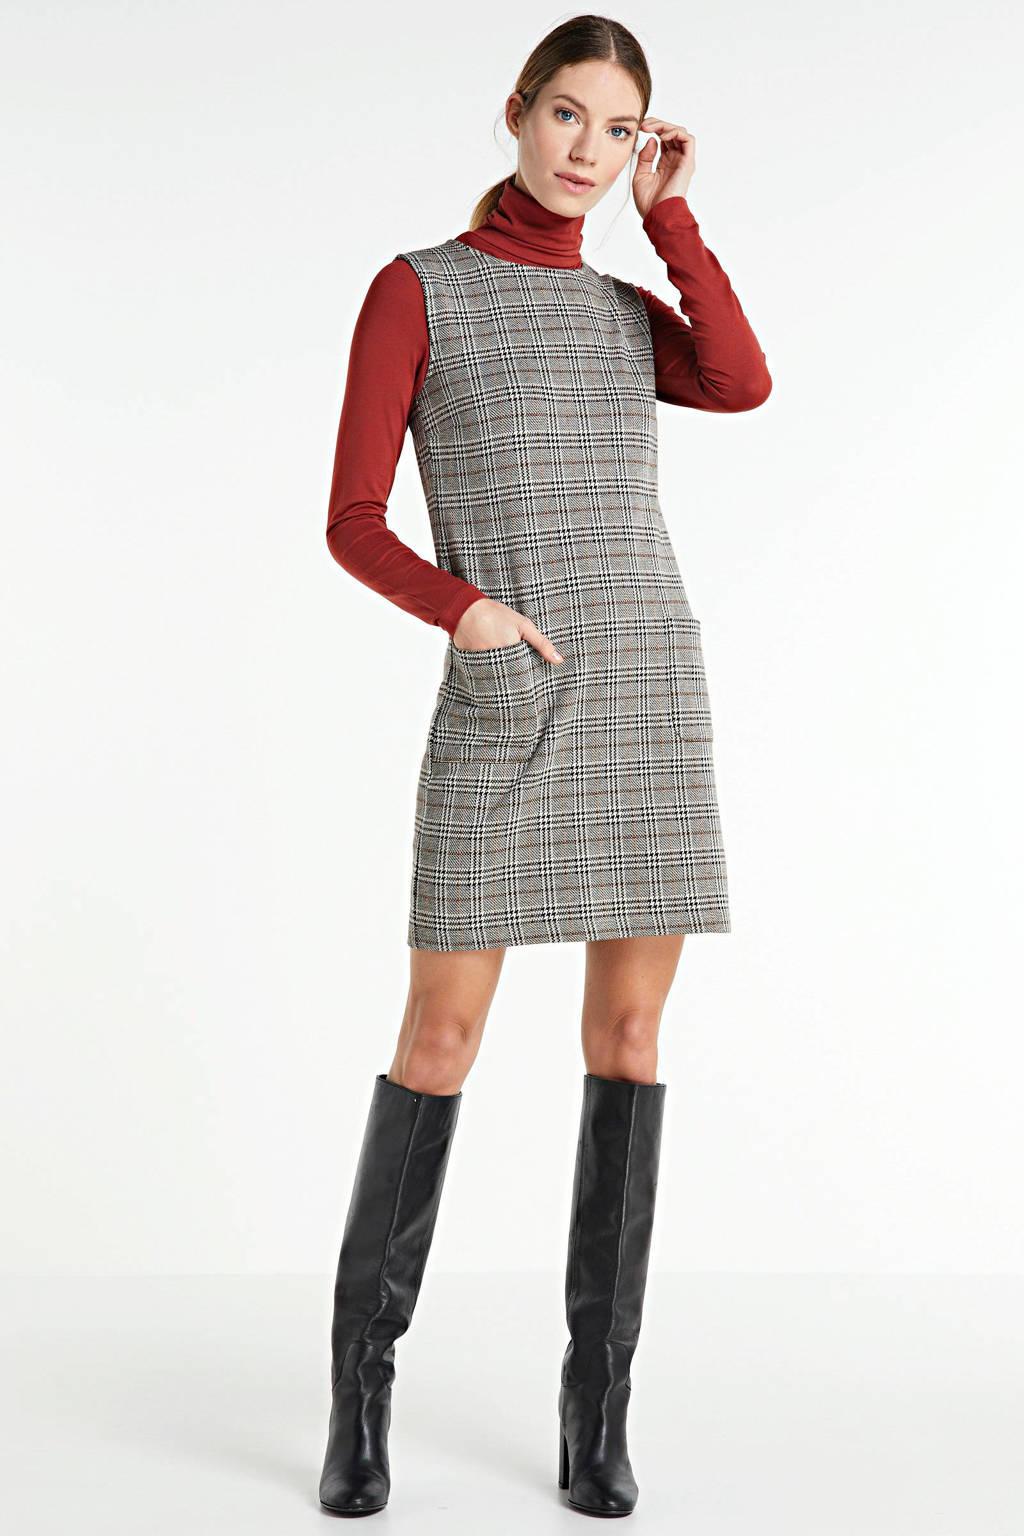 anytime jurk met ruitpatroon ecru/camel/zwart, Ecru/camel/zwart